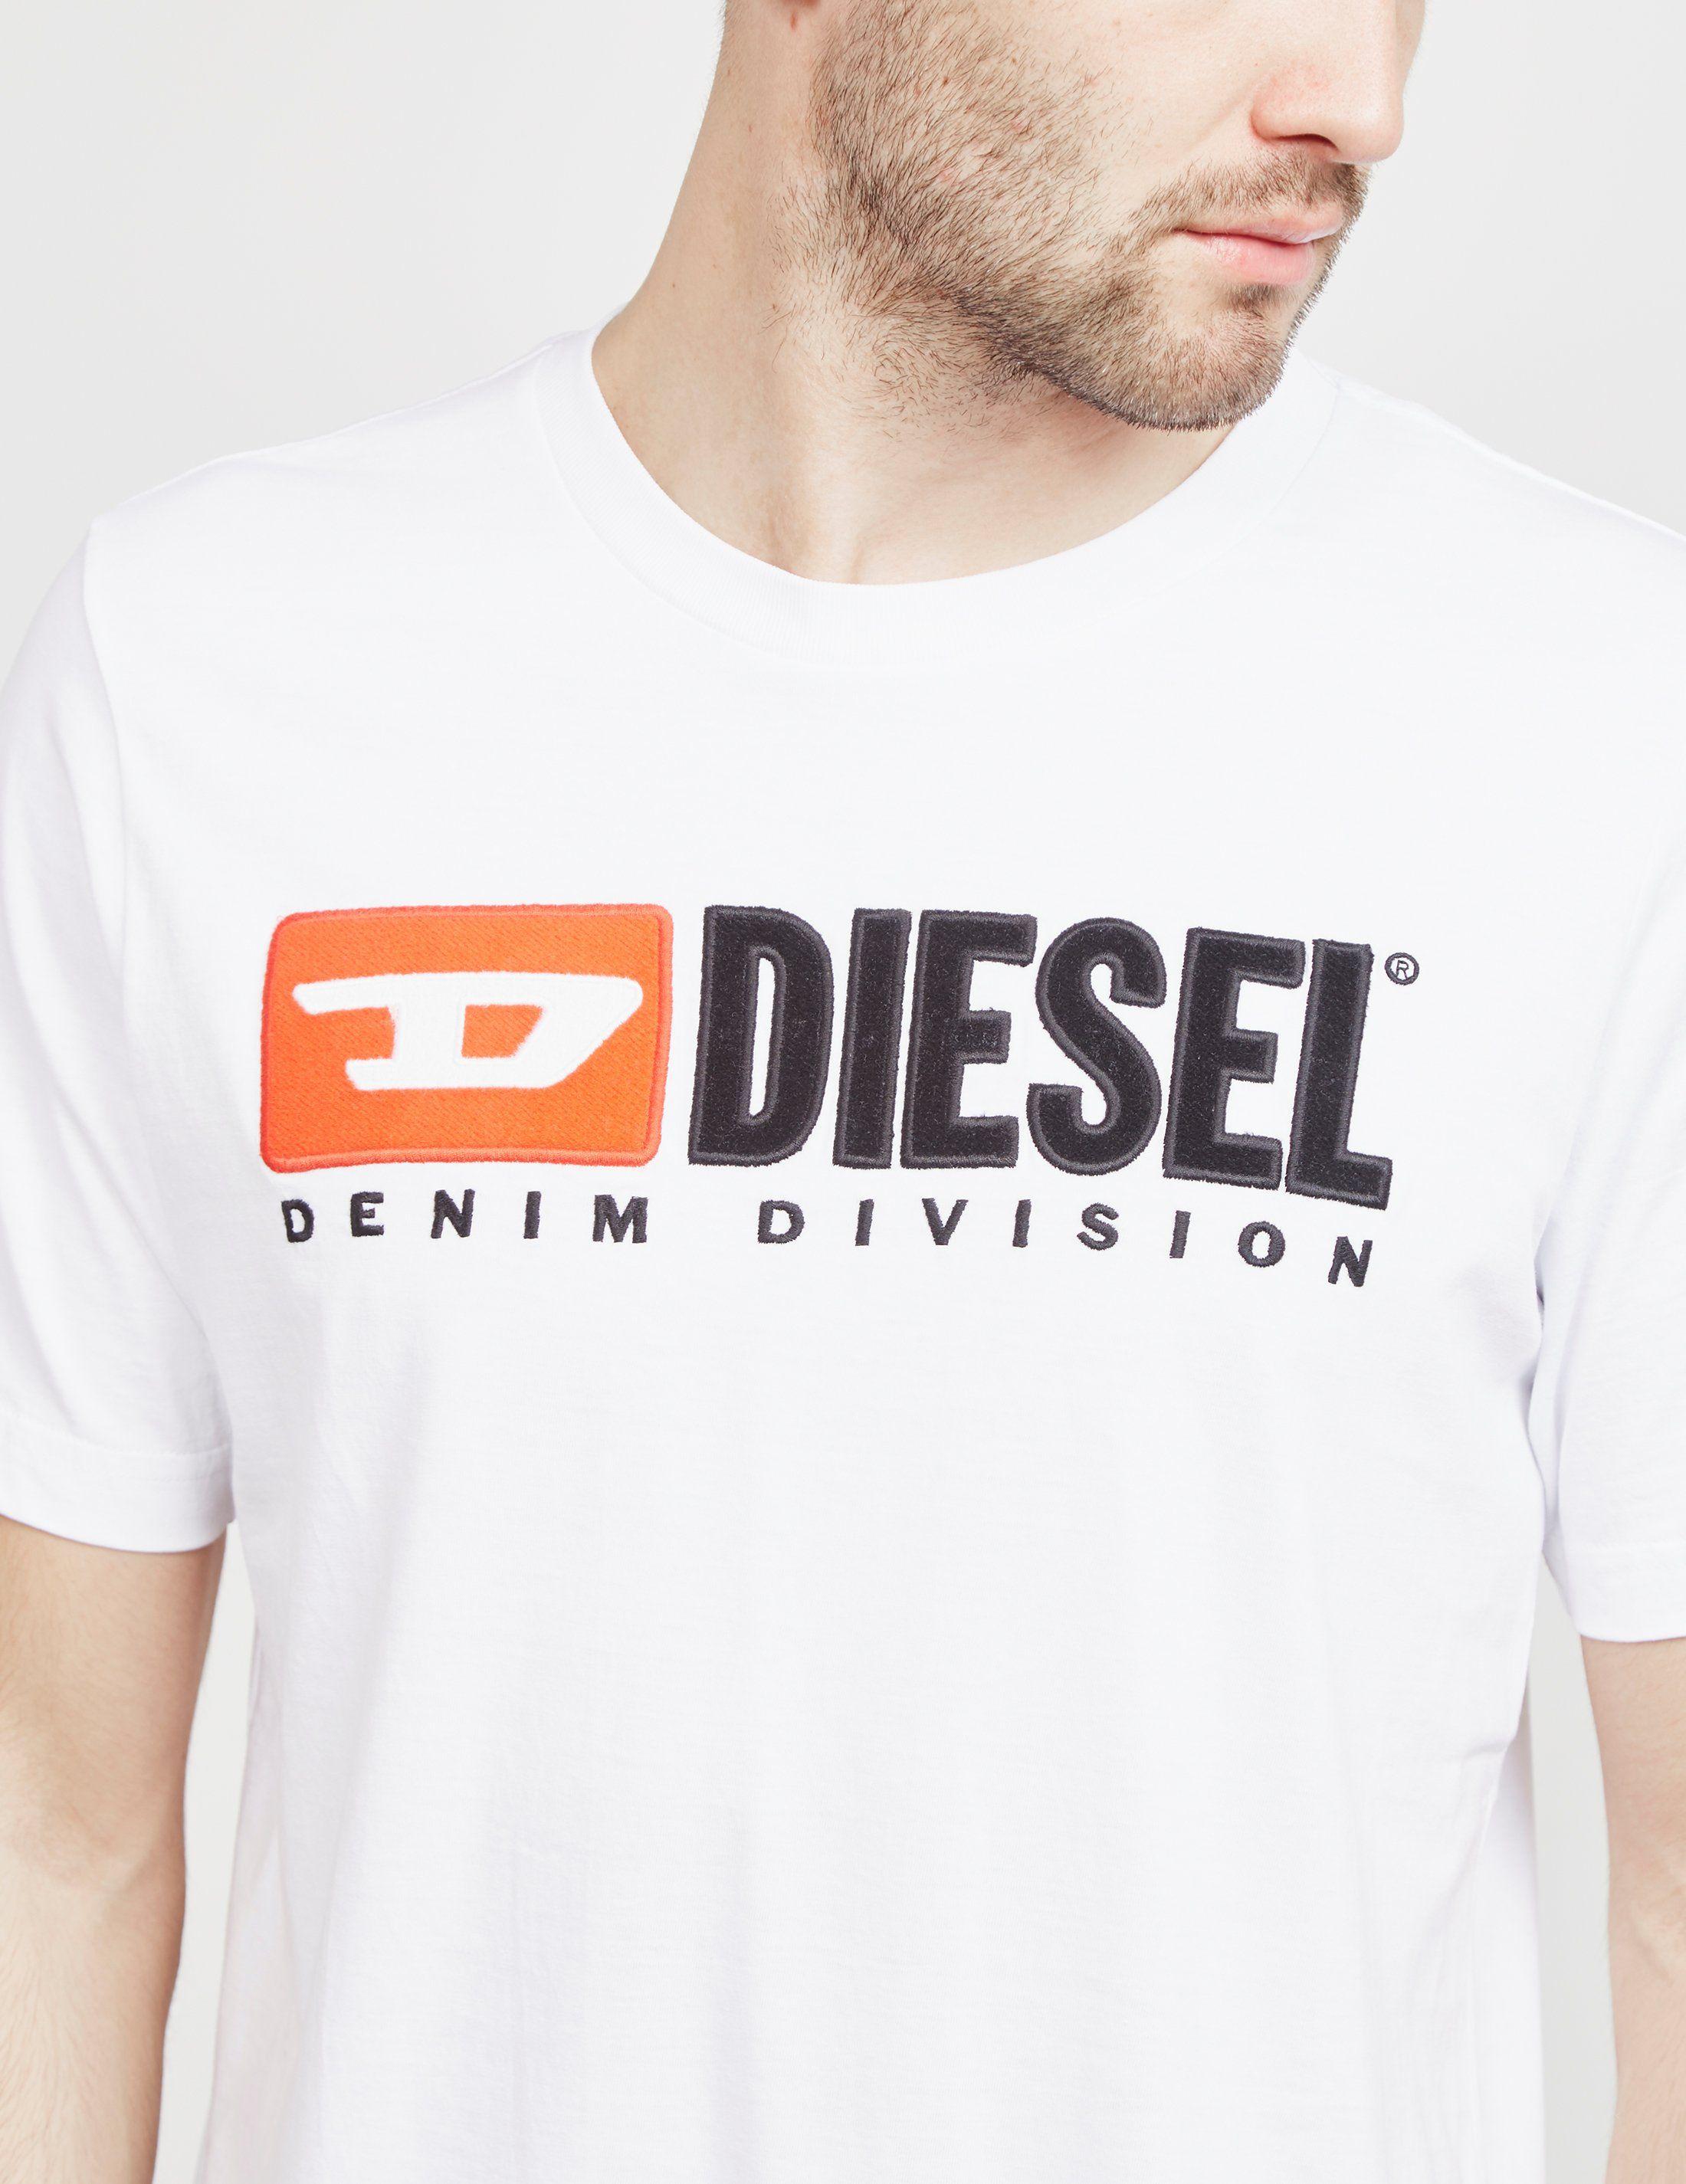 Diesel Division Short Sleeve T-Shirt